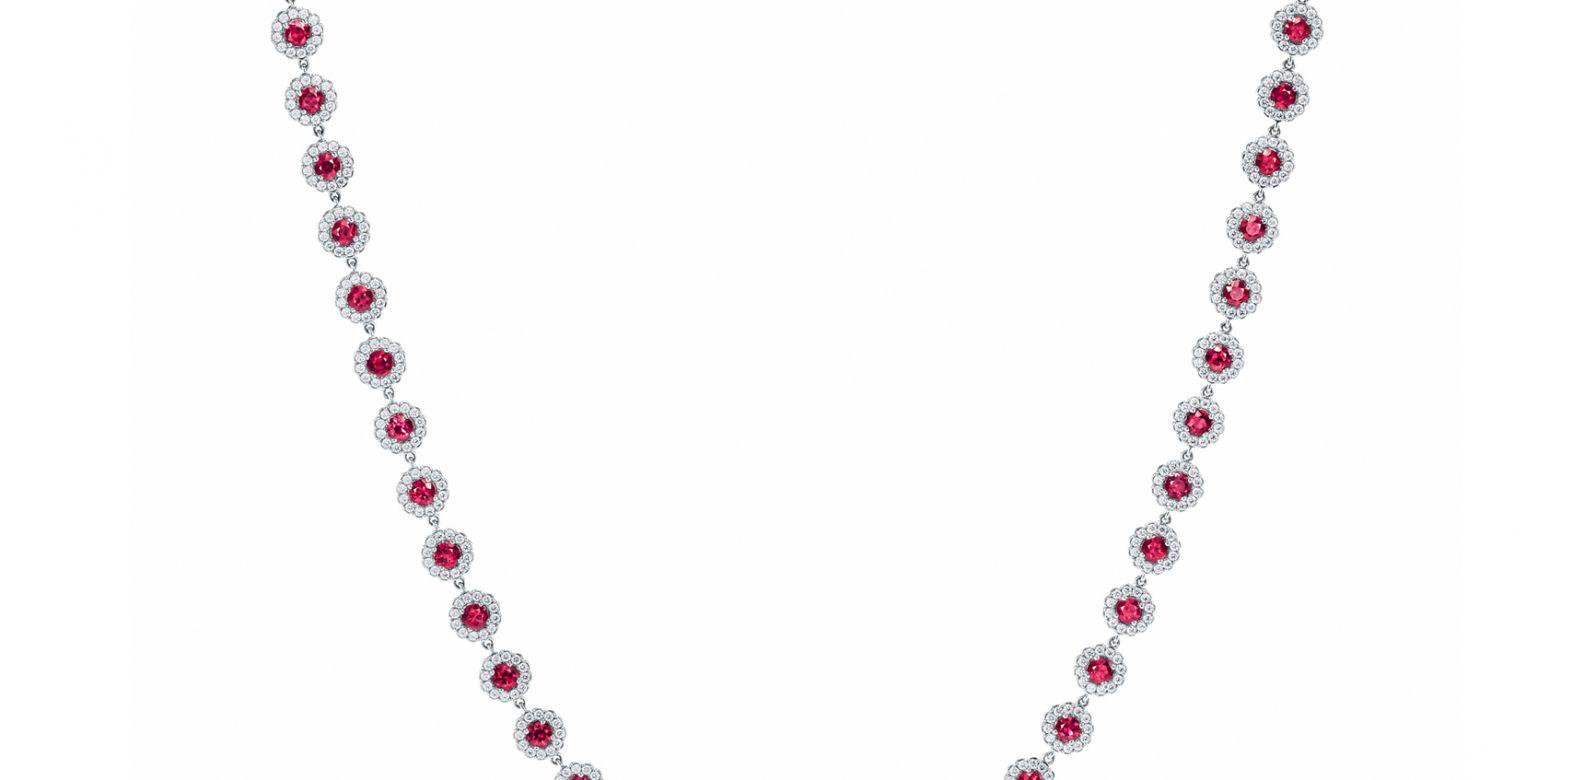 Necklace, Tiffany Cobblestone collection